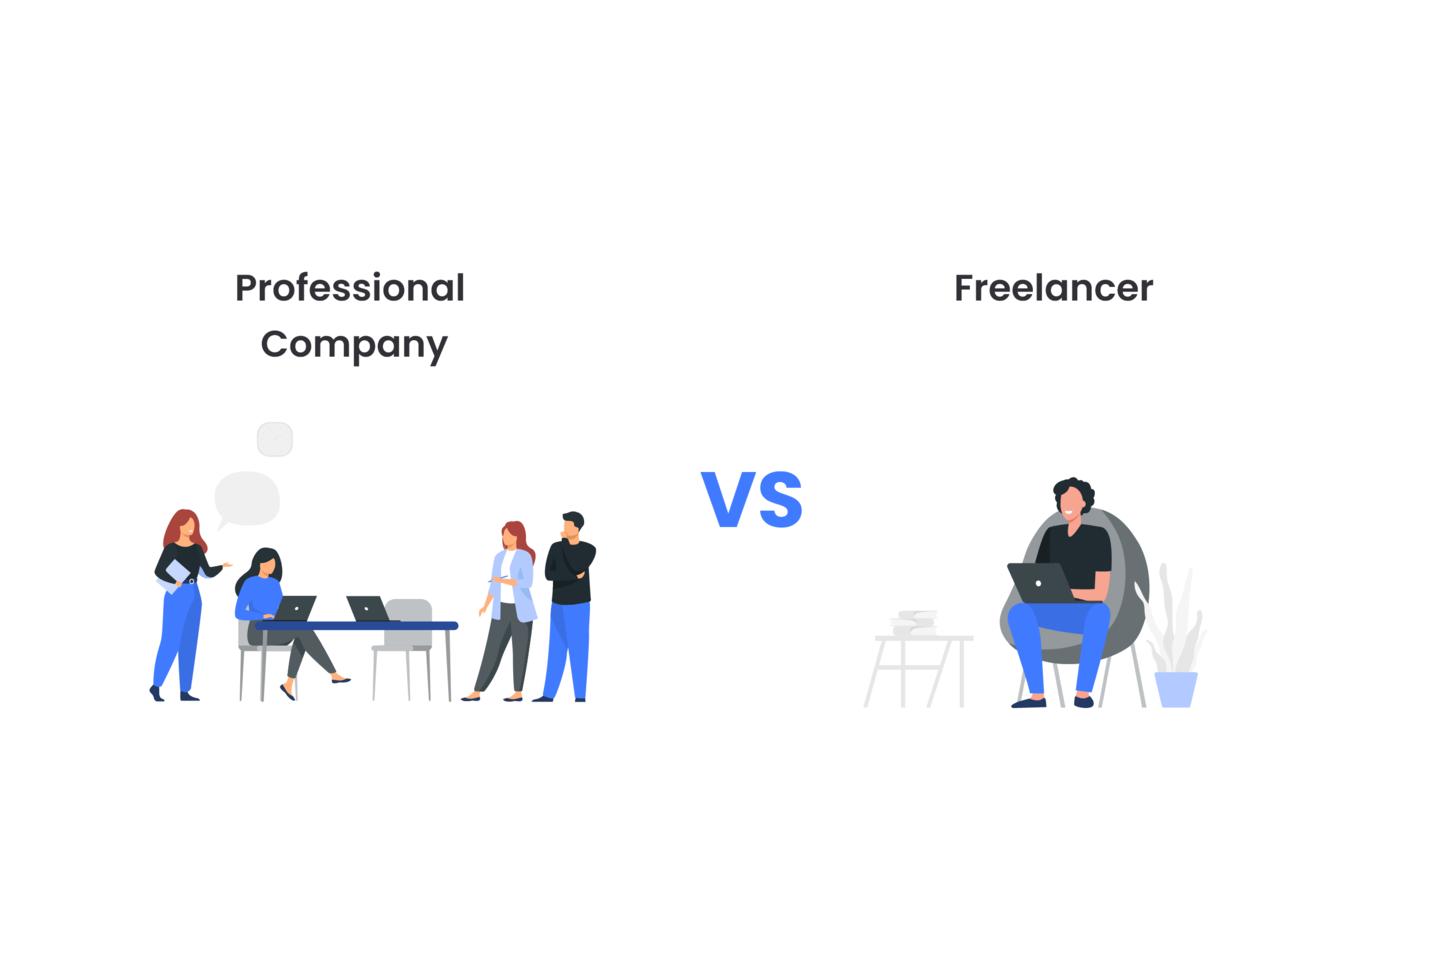 Mobile App Development Company vs Freelancer